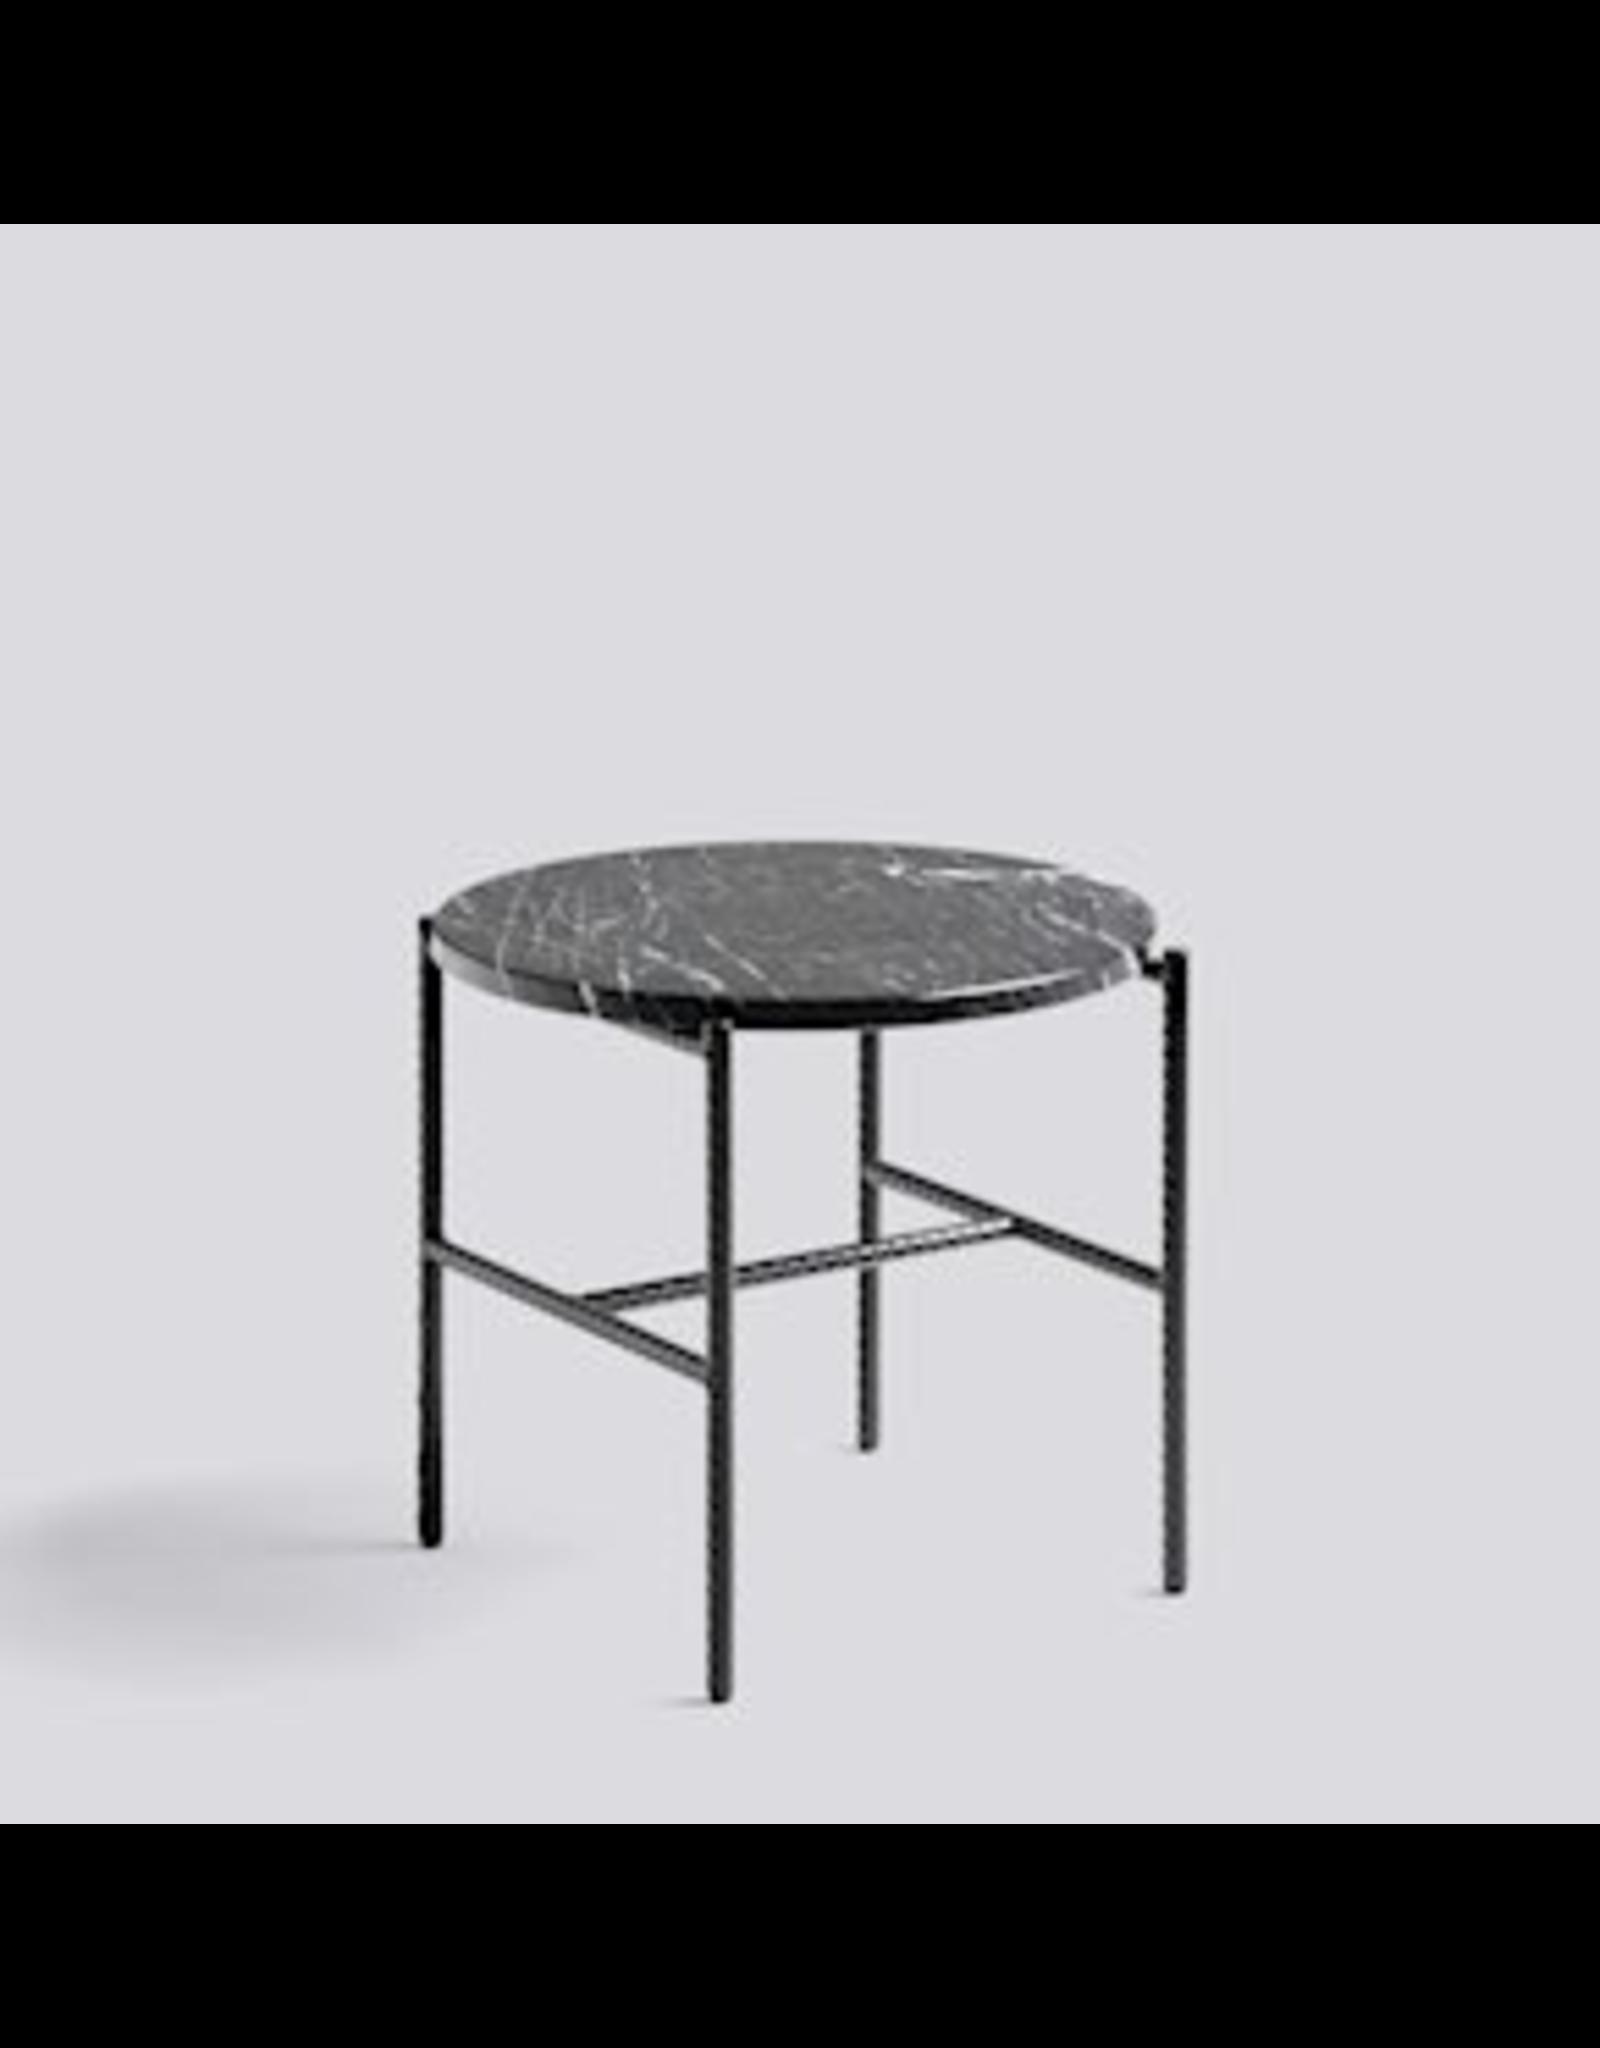 HAY REBAR SIDE TABLE / SOFT BLACK POWDER COATED STEEL MARBLE /Ø45 X H40.5